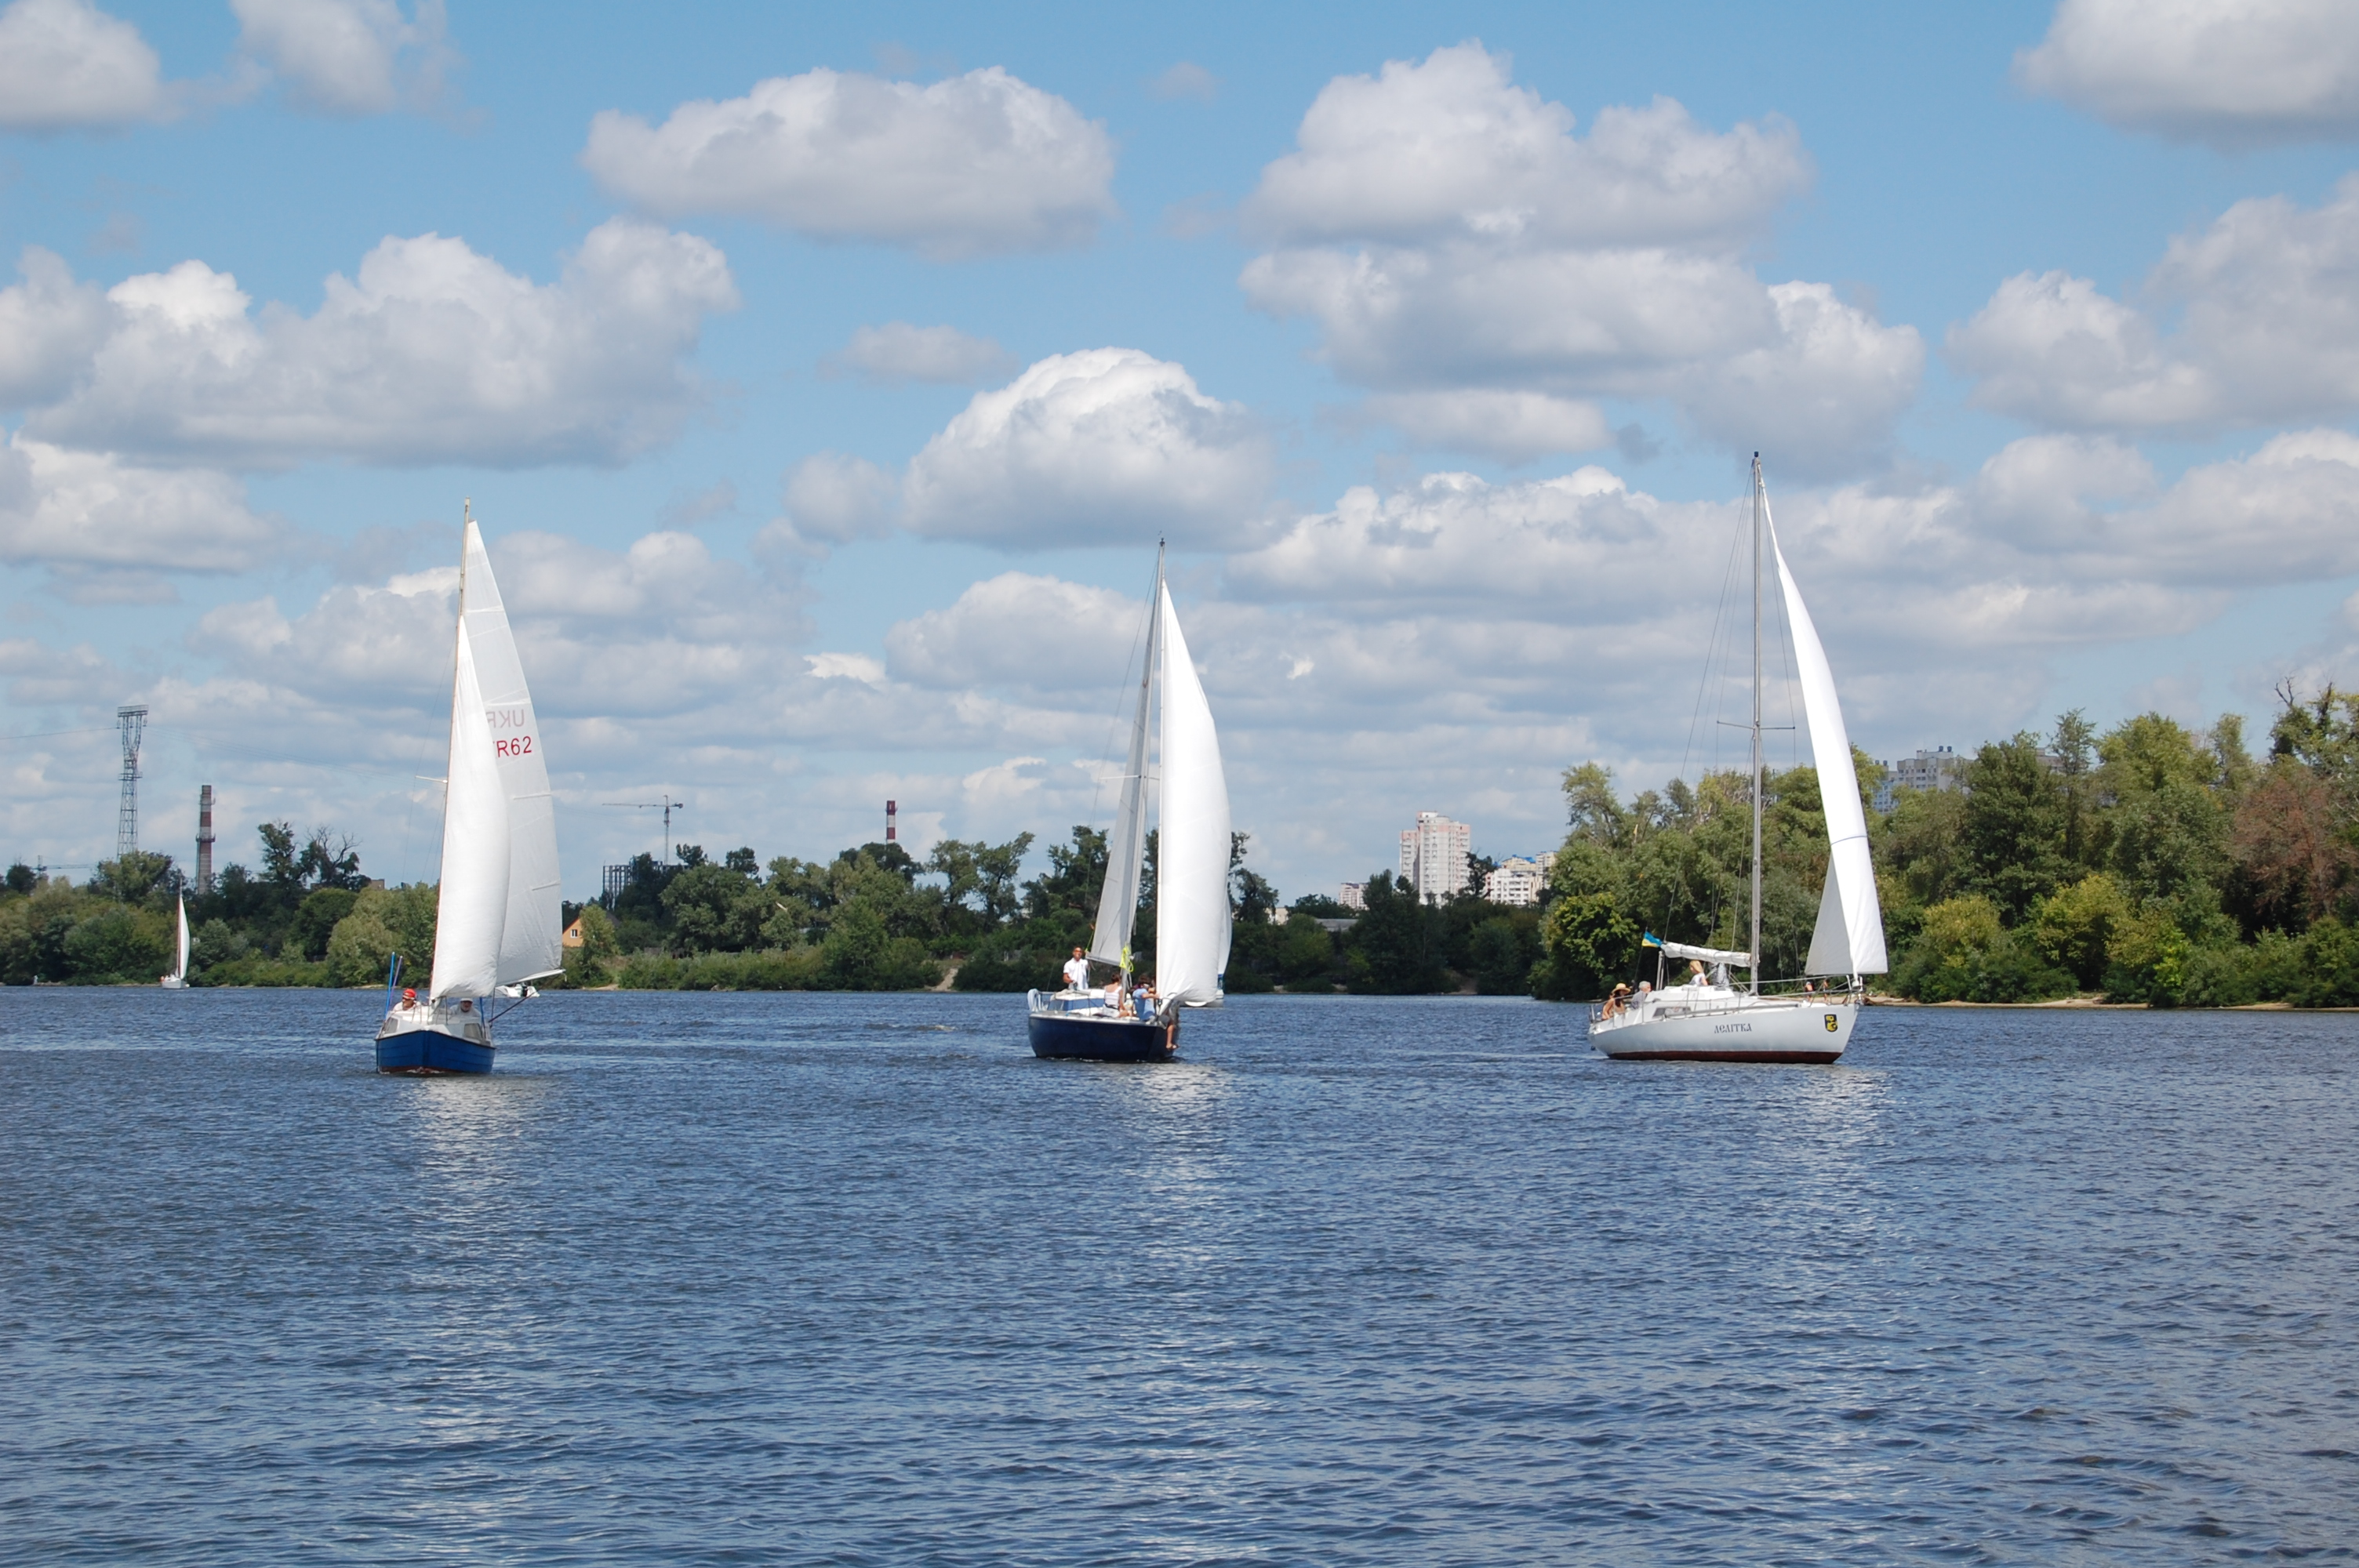 Яхтенный поход на 3 яхты